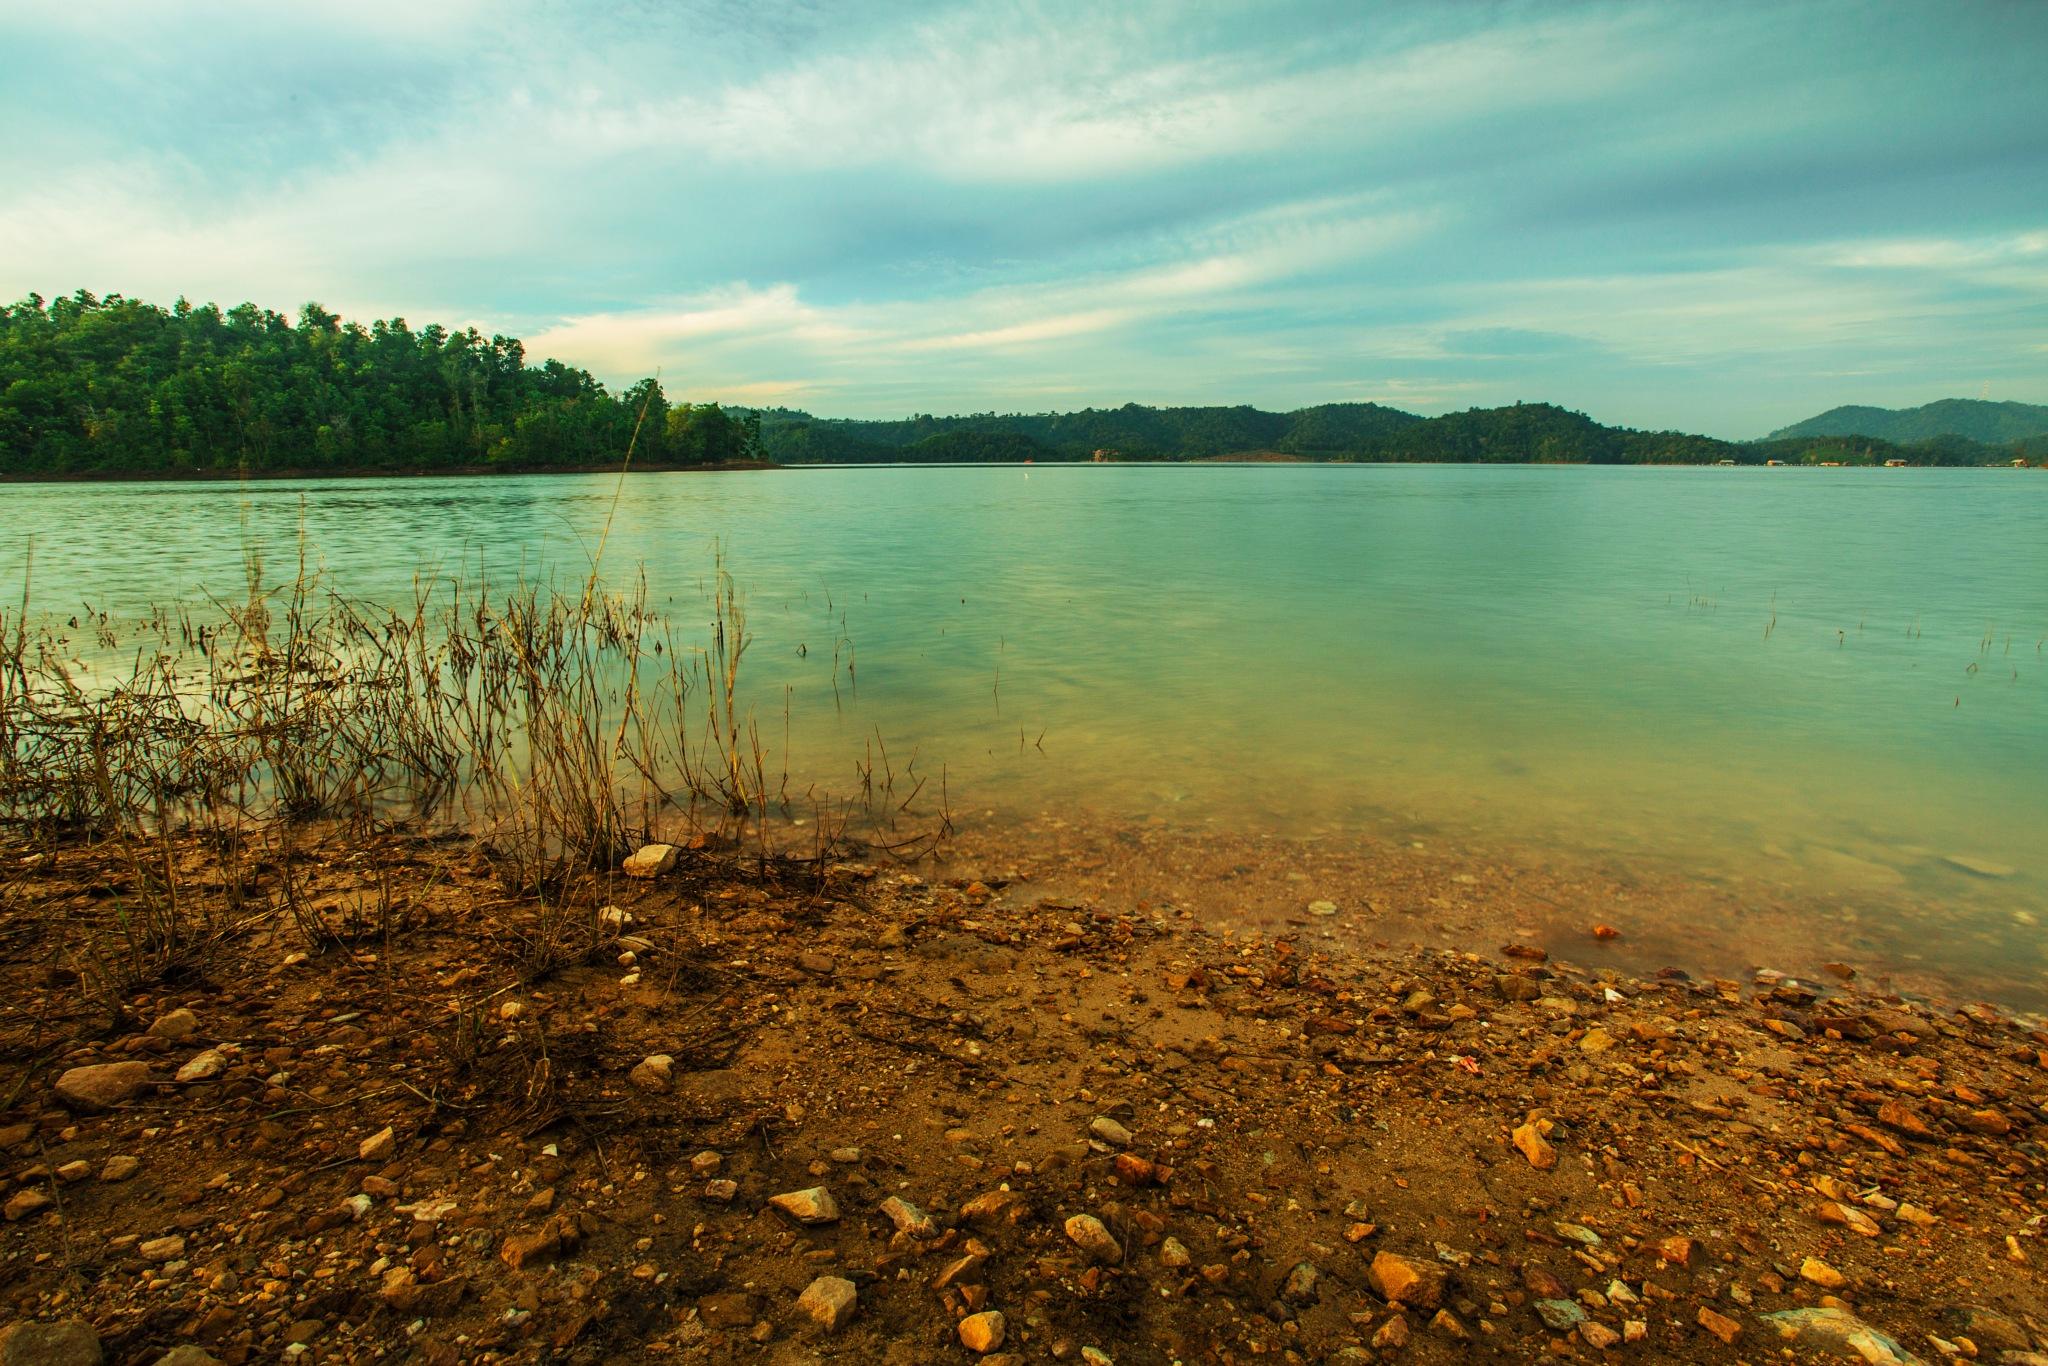 Koto Panjang lake 3 by Syafri Gamal